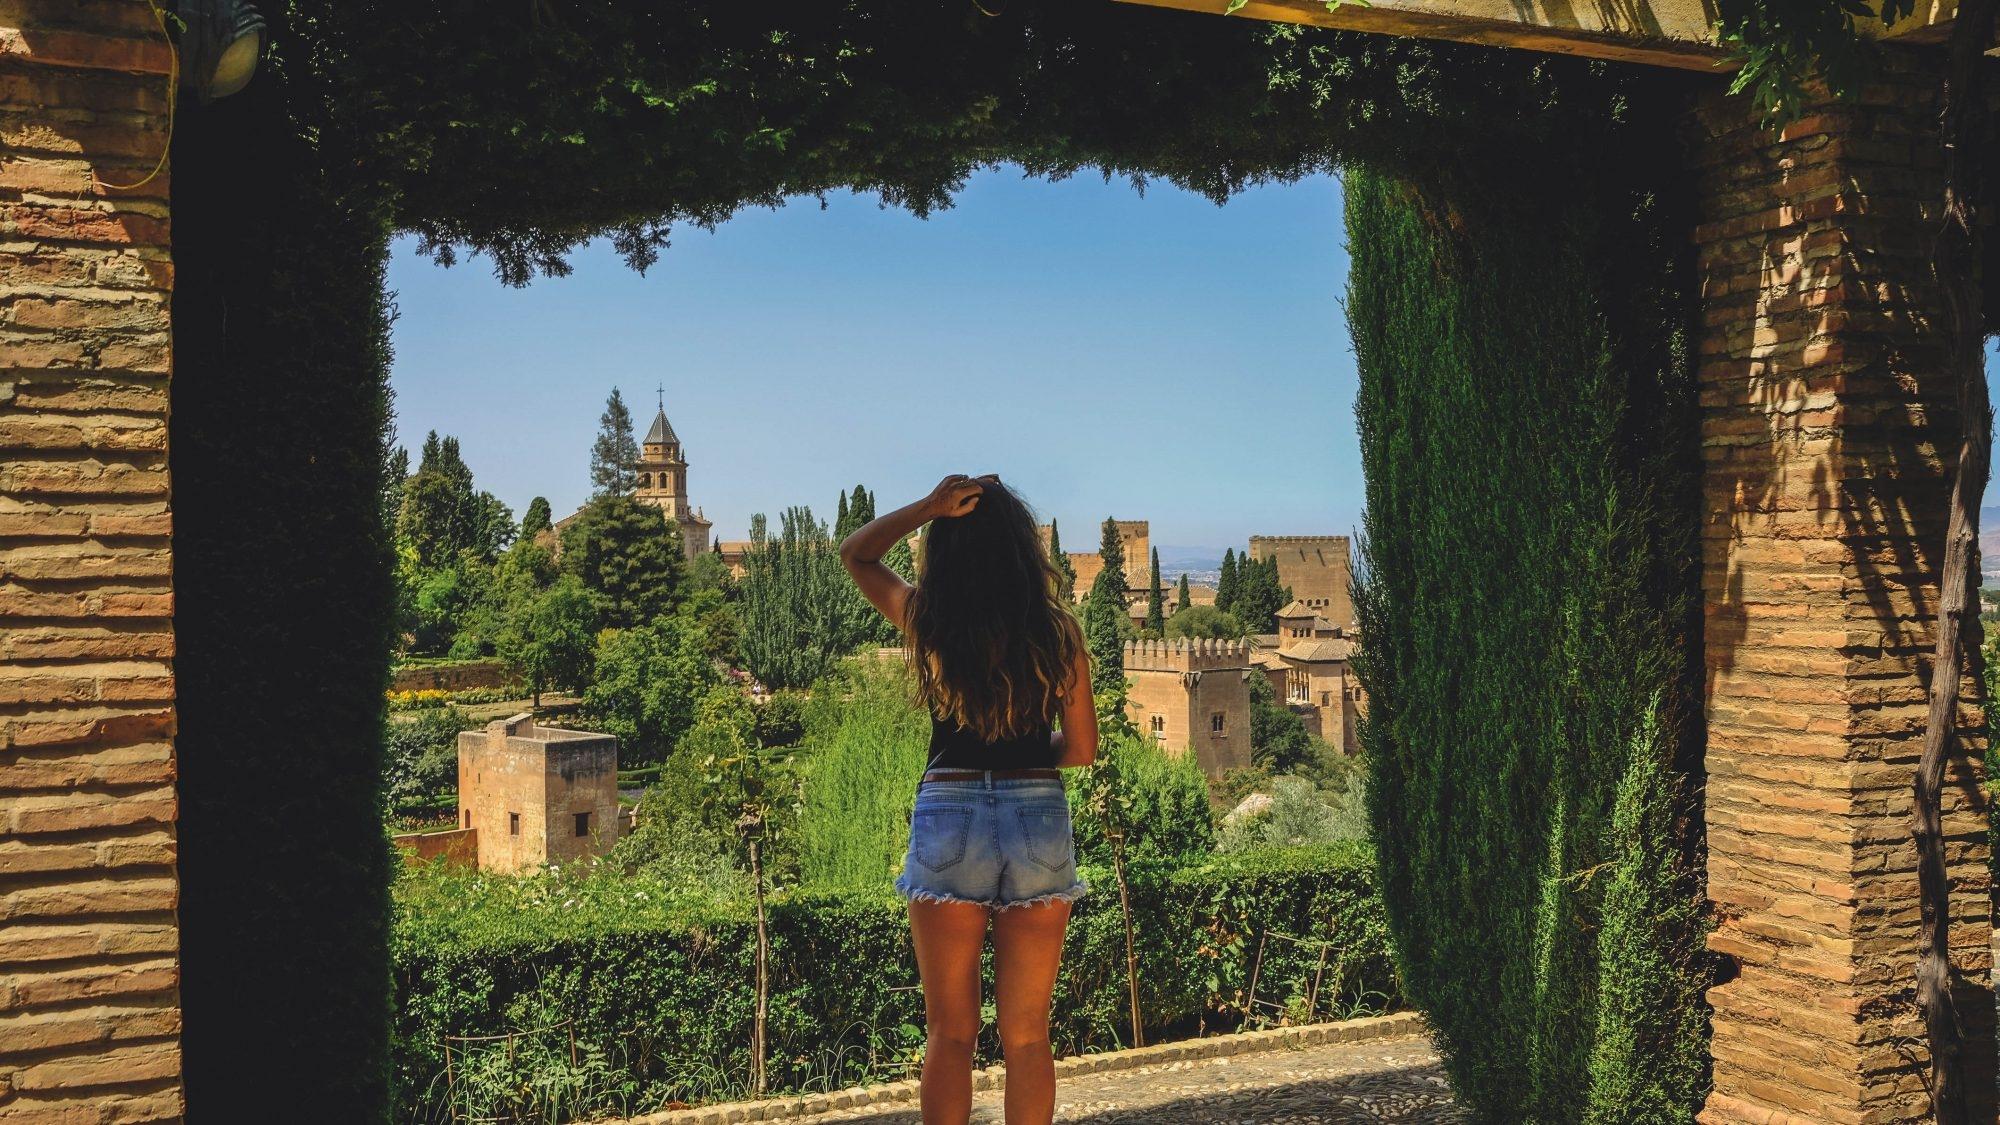 Mimi qui regarde les palais Nasrides au loin